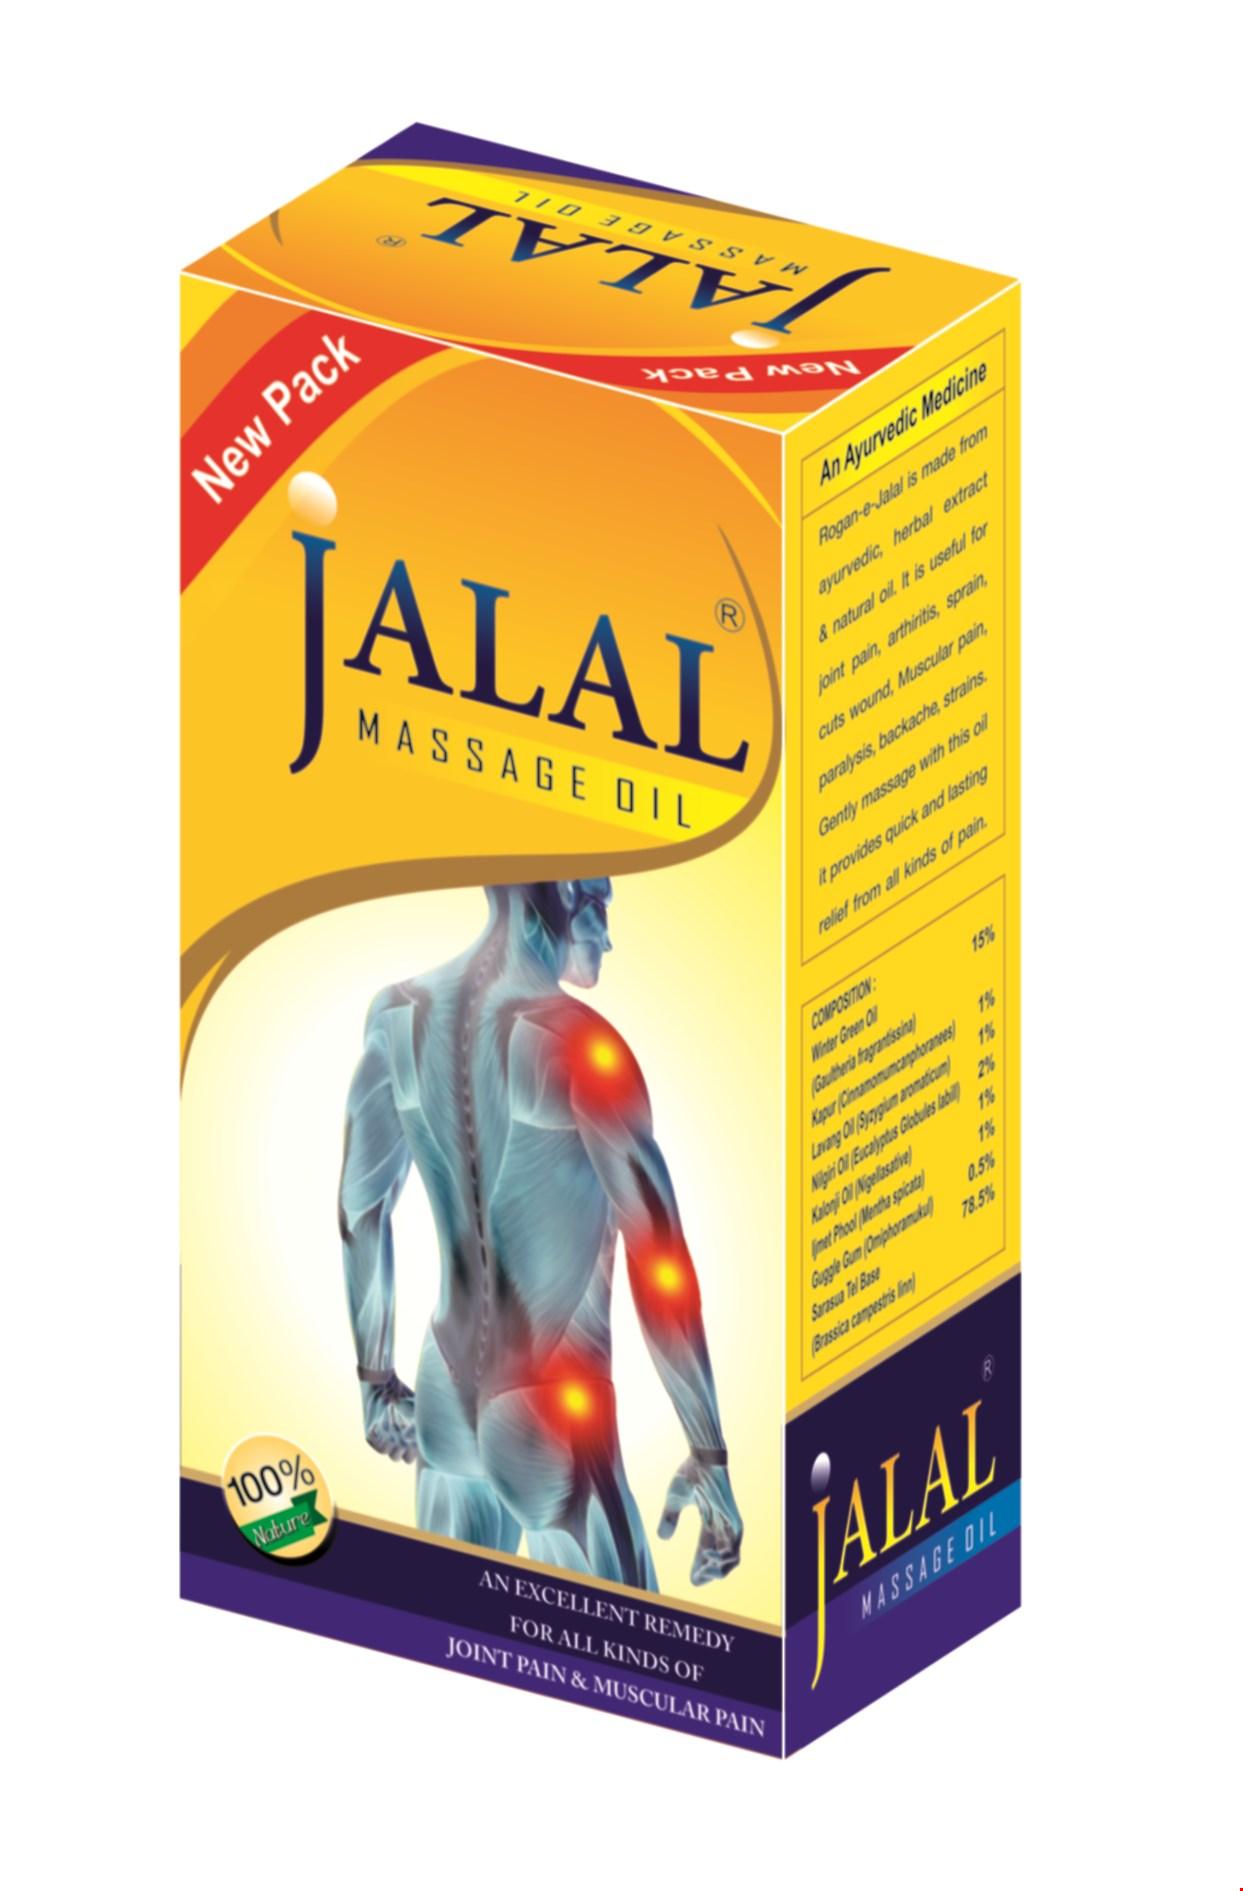 JALAL MASSAGE OIL